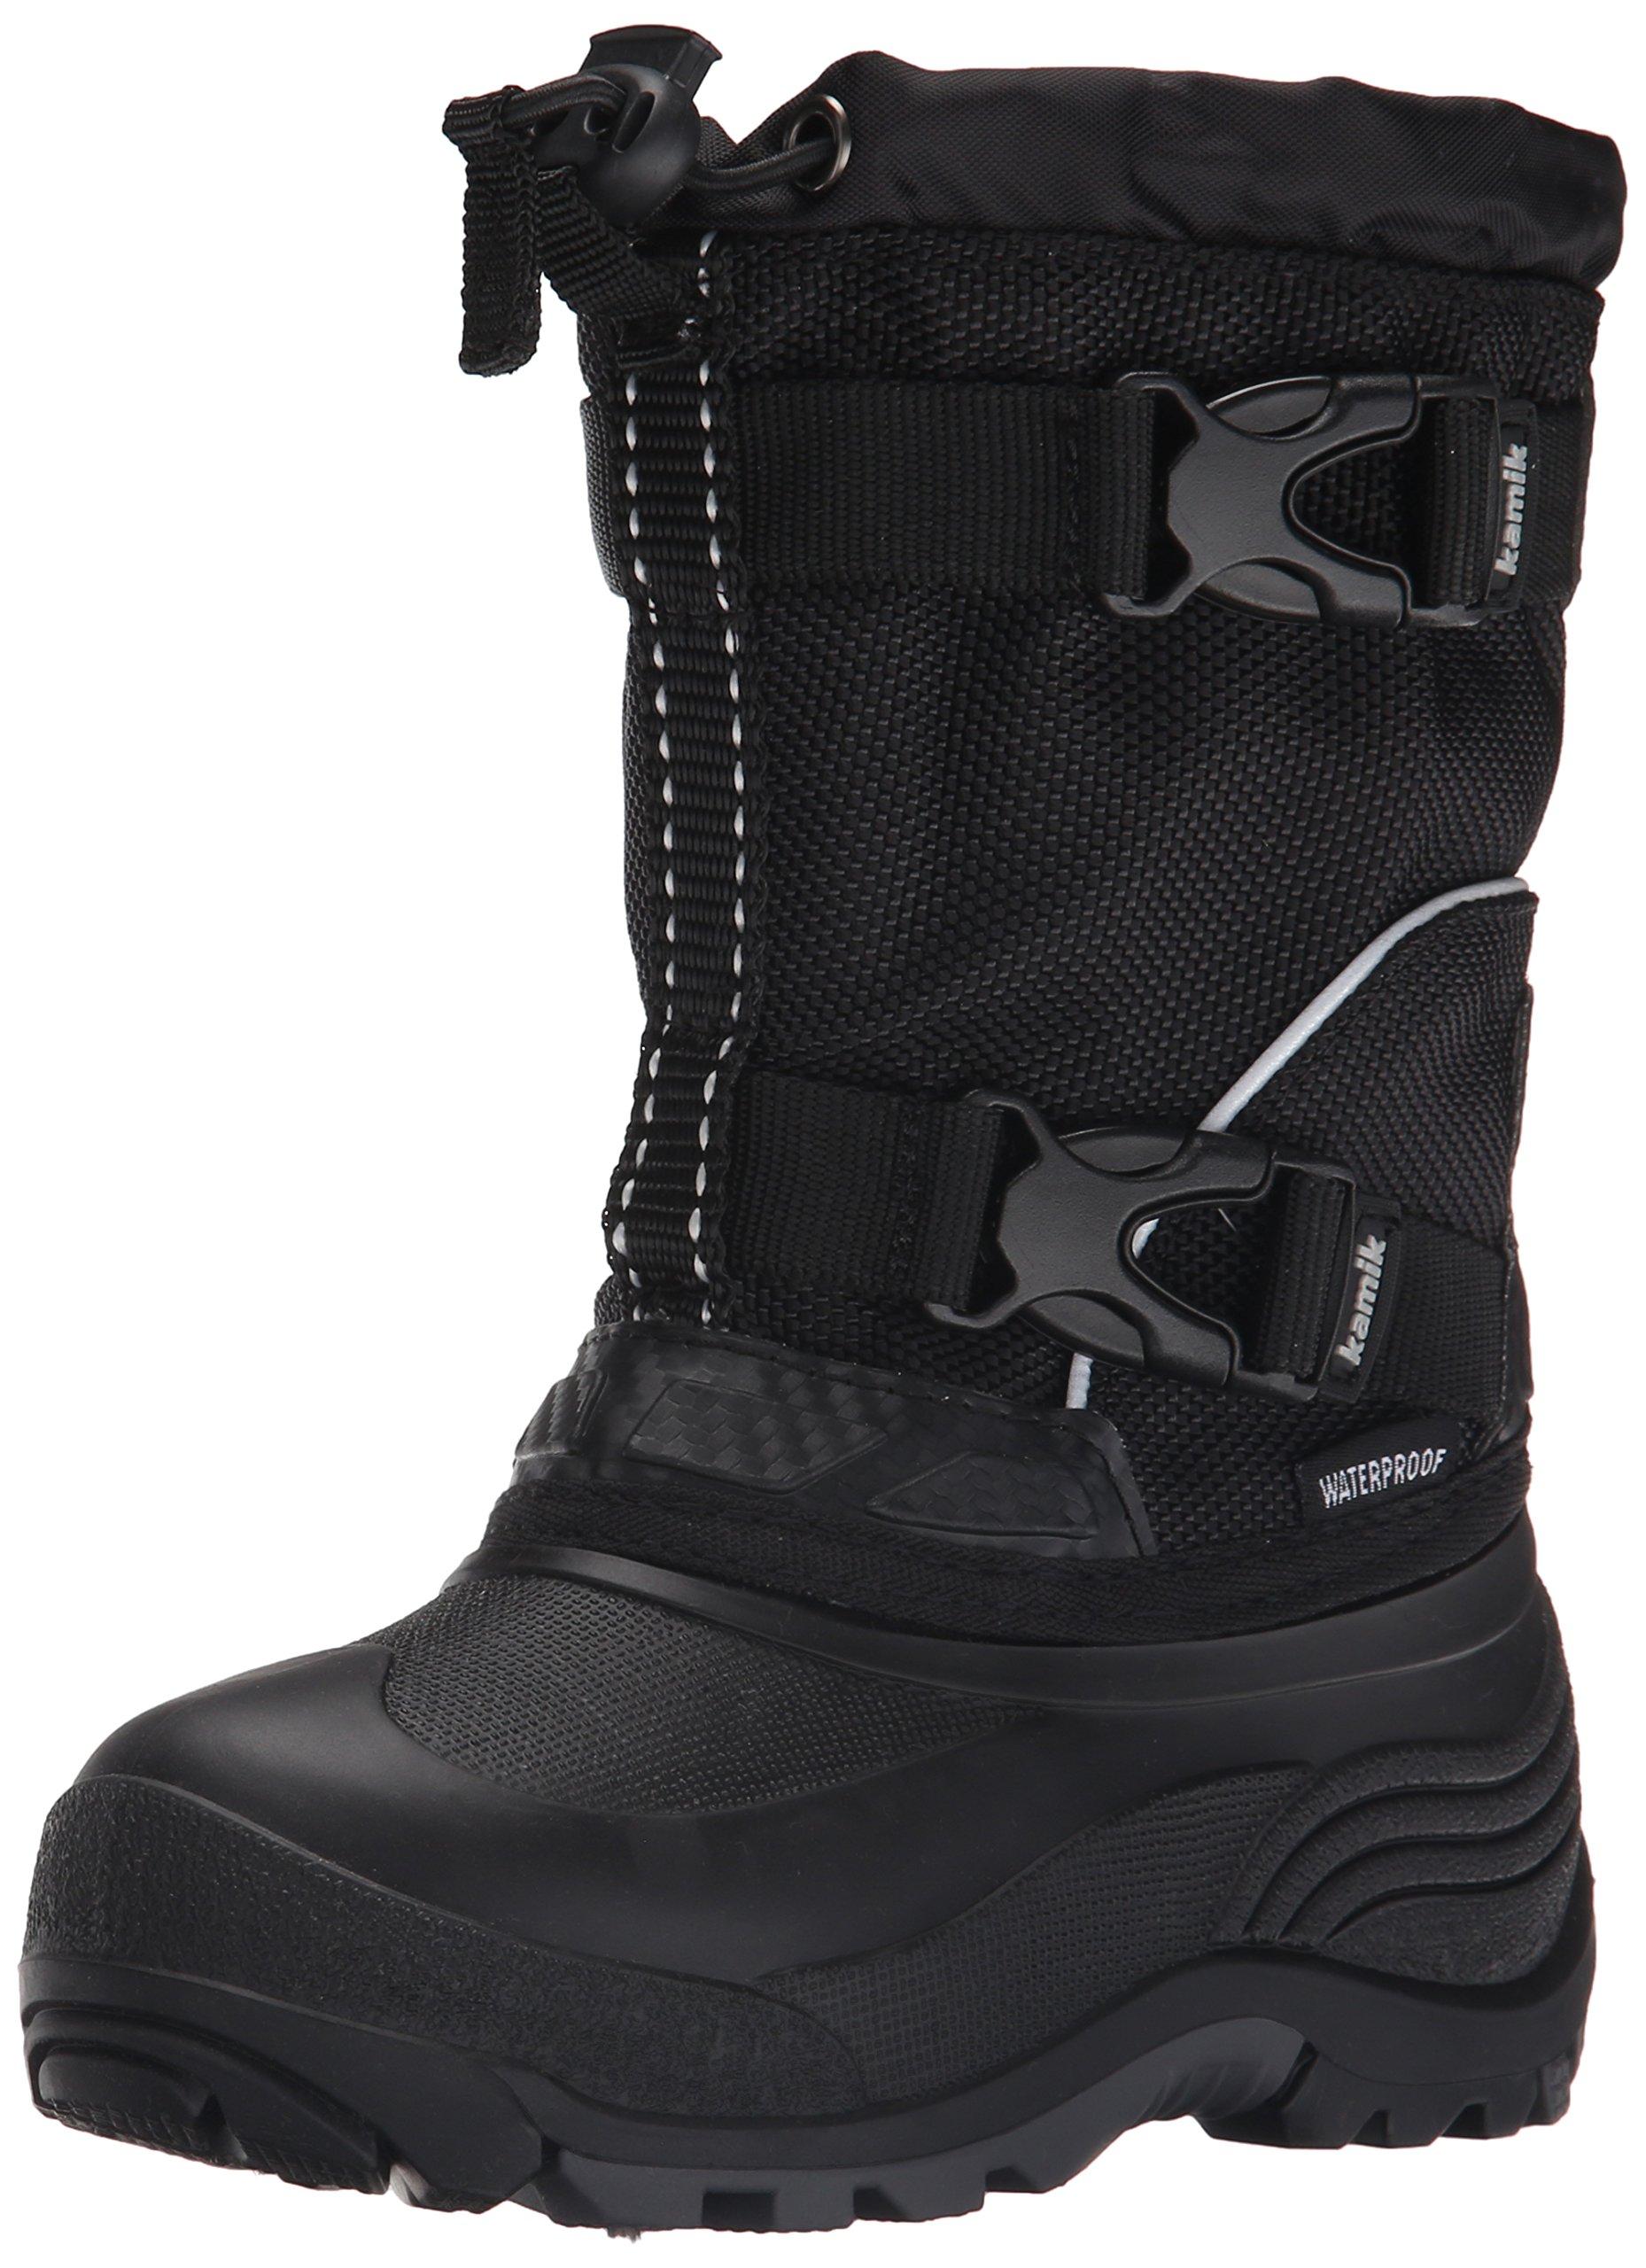 Kamik Glacial Kids Winter Boot (Toddler/Little Kid/Big Kid), Black/Black, 10 M US Toddler